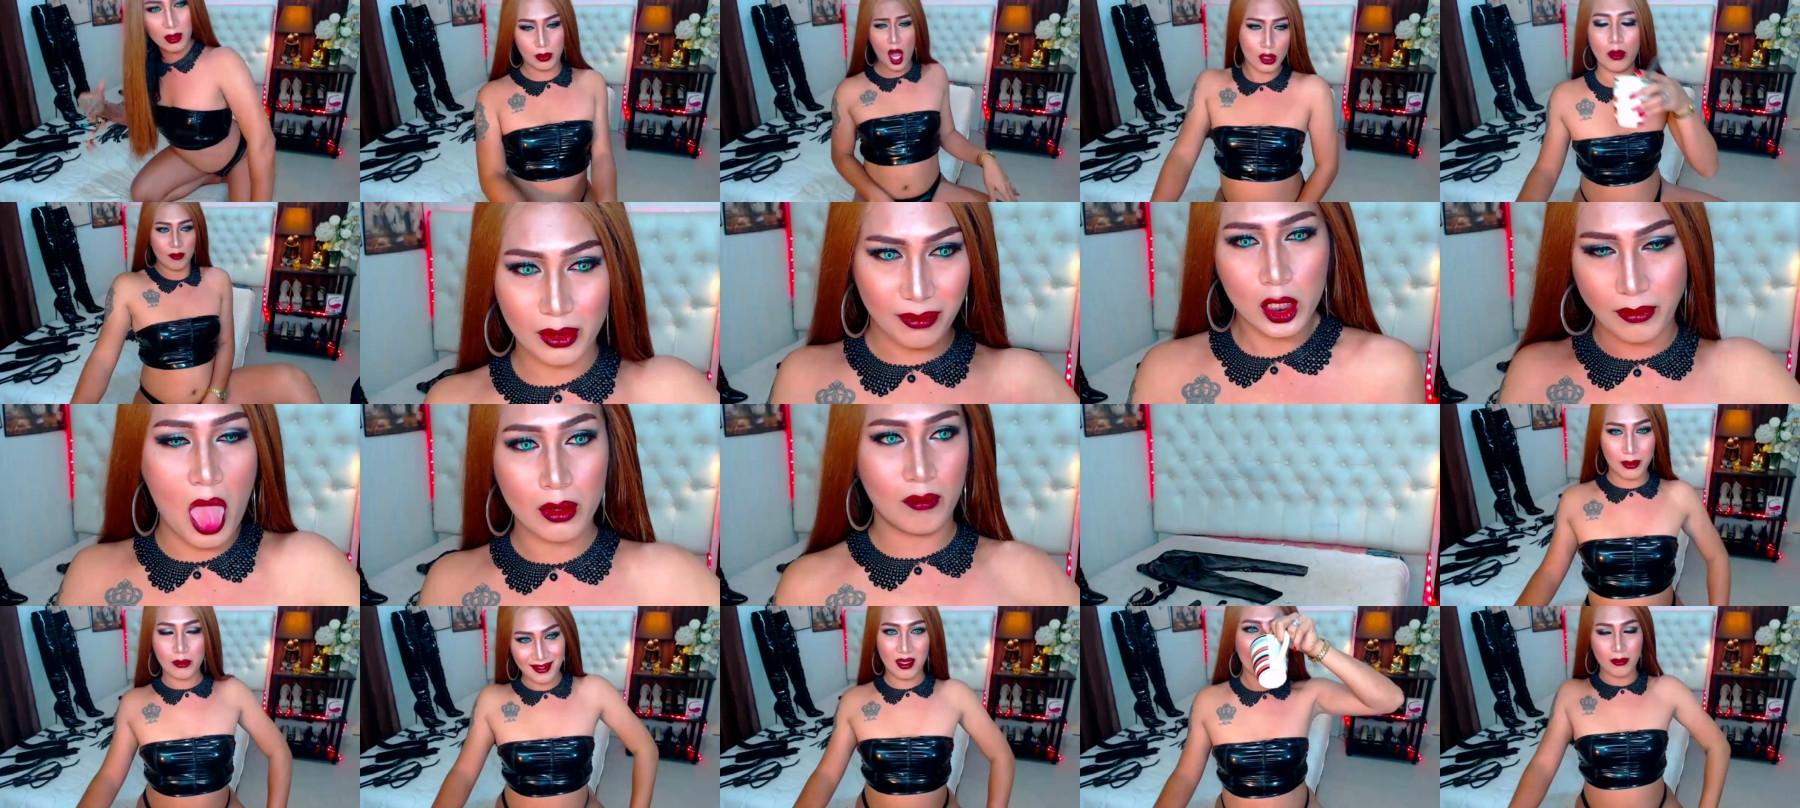 Sexydivaolala ts 17-04-2021 Chaturbate trans Pretty